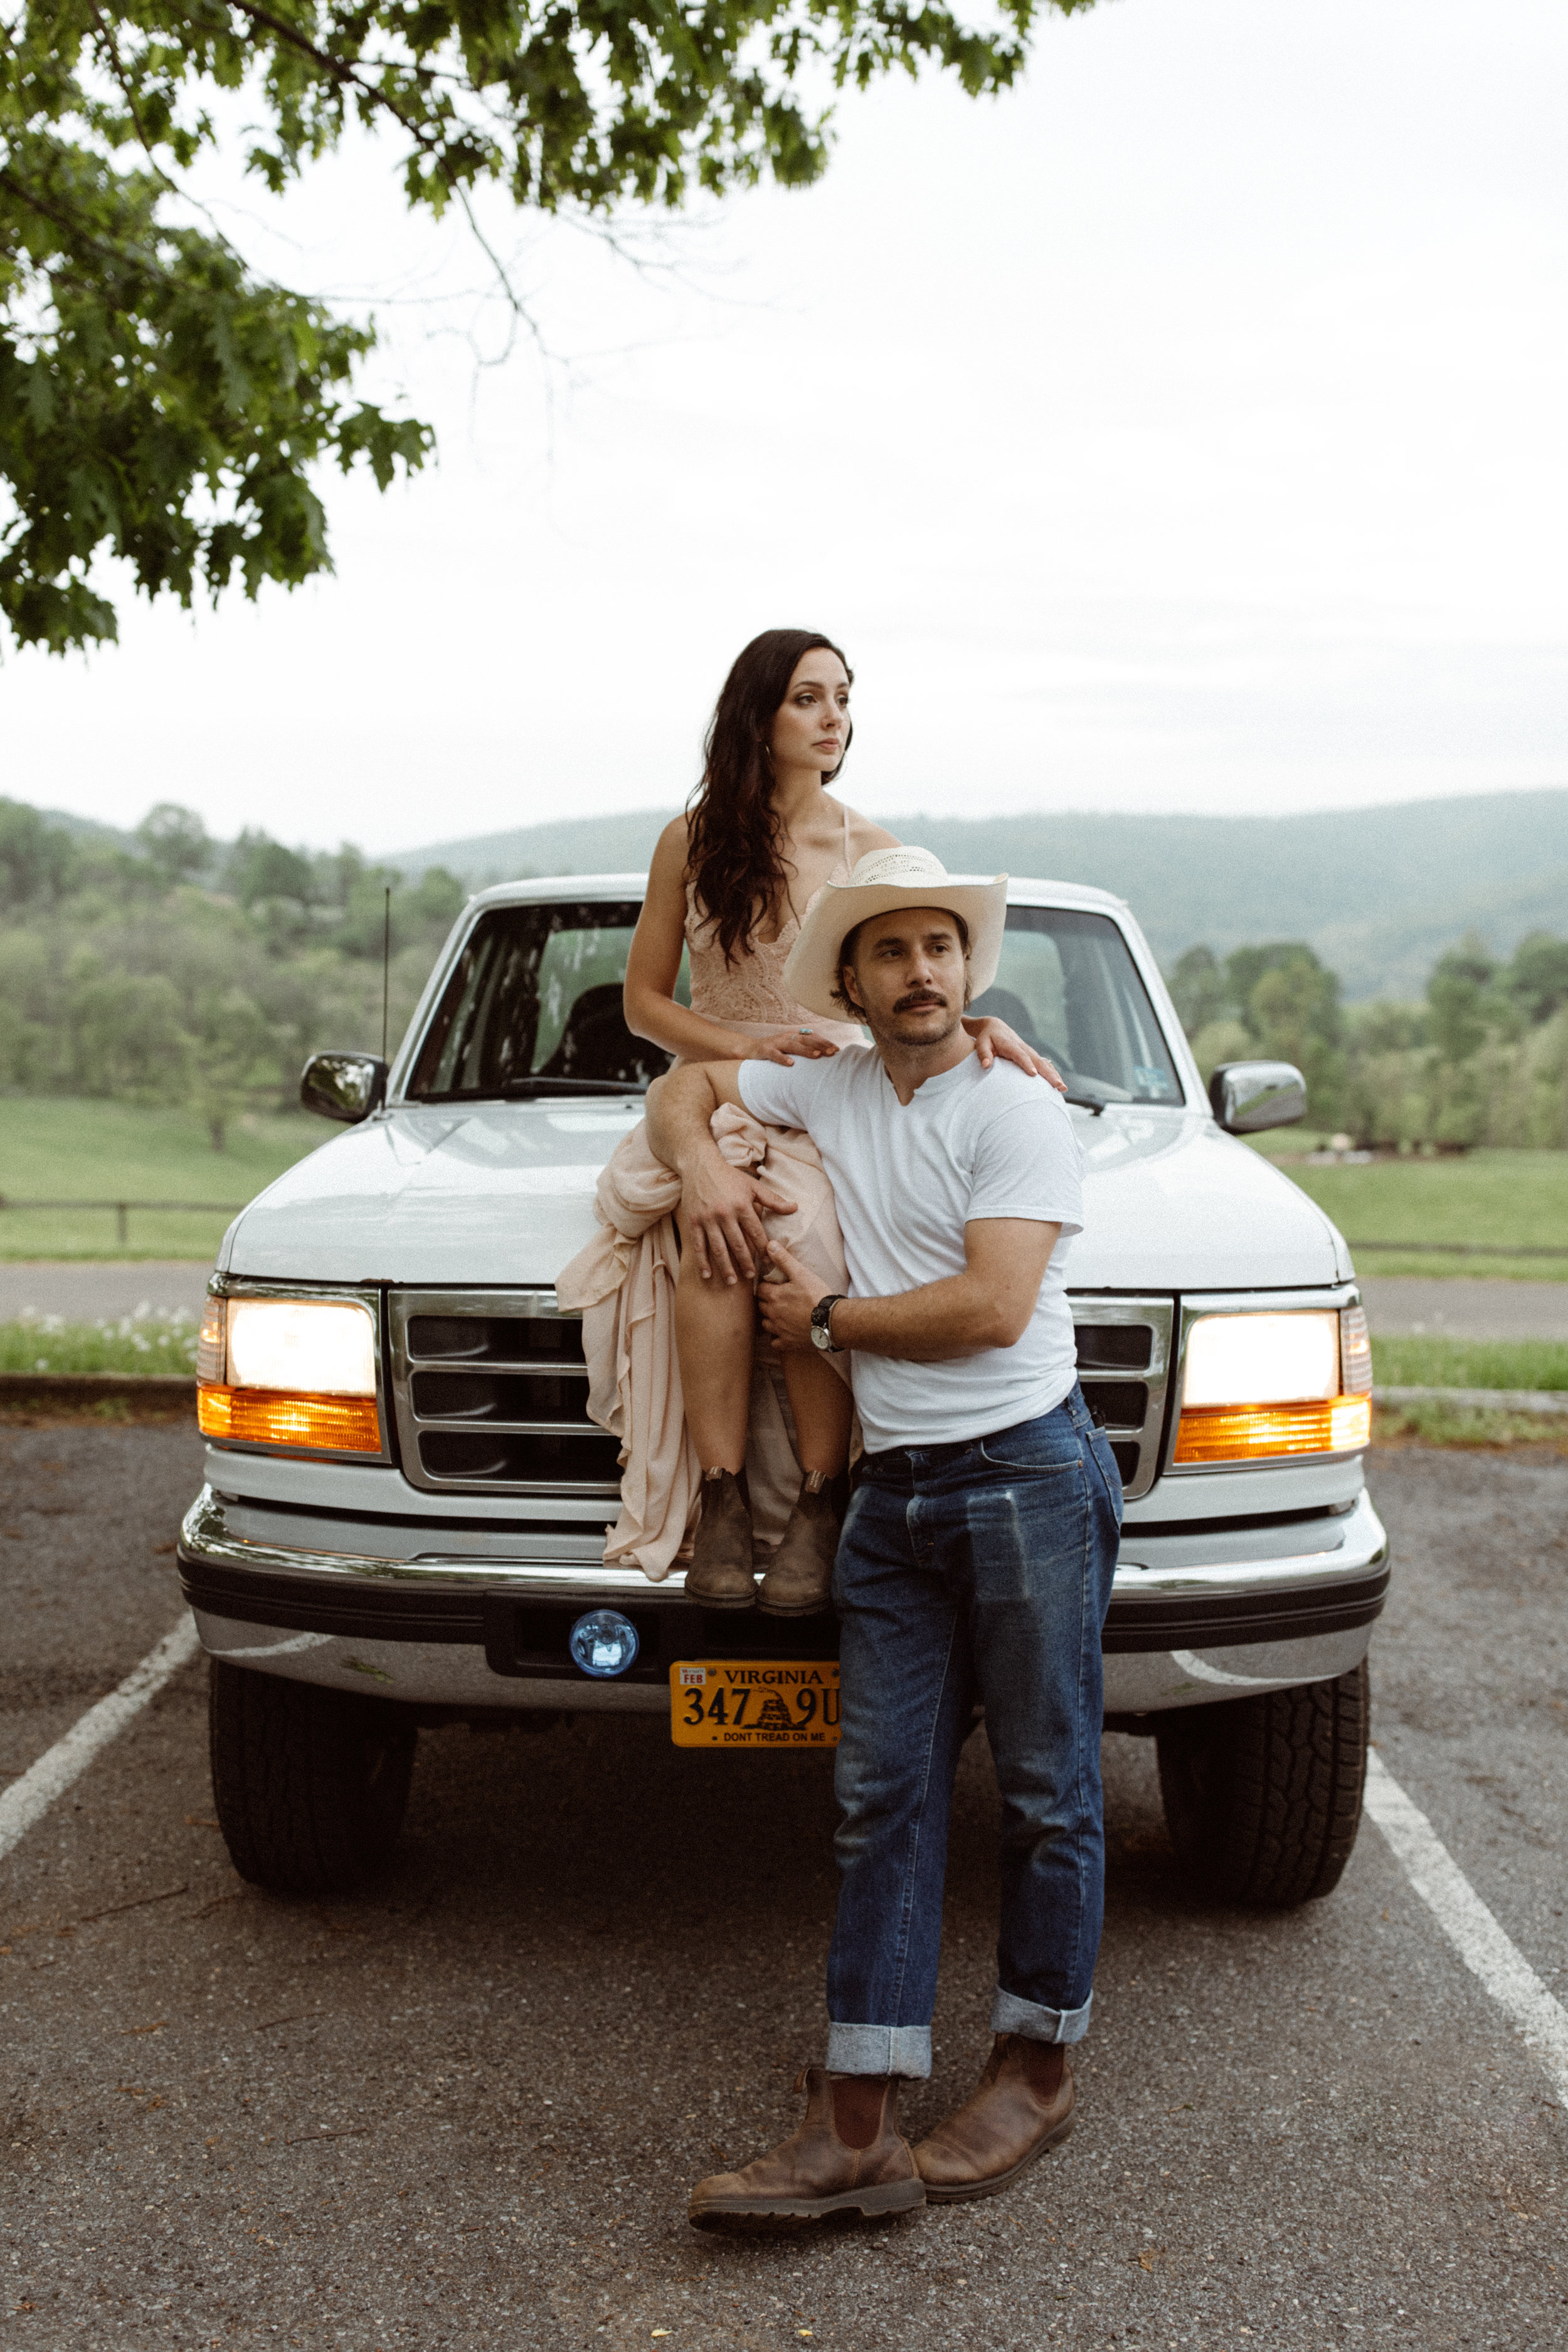 kelsey&mark-engagement-skymeadows-2019-peytoncurry-0196.jpg